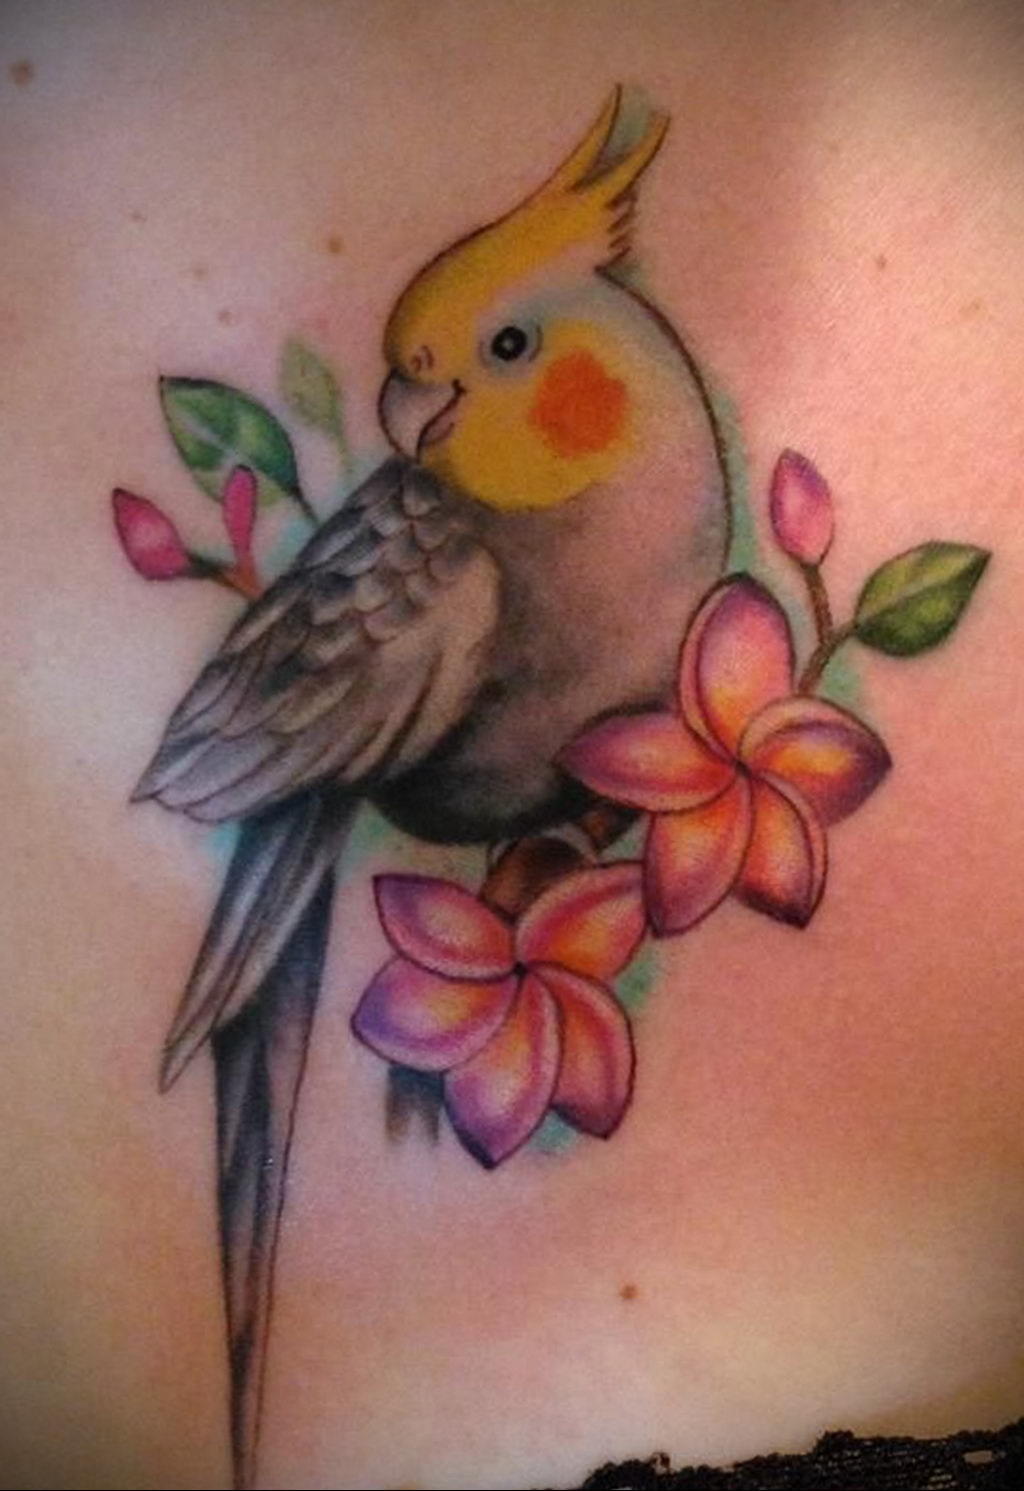 Фото тату про любовь рисунок Птица 03.02.2020 №055 -bird tattoo- tatufoto.com